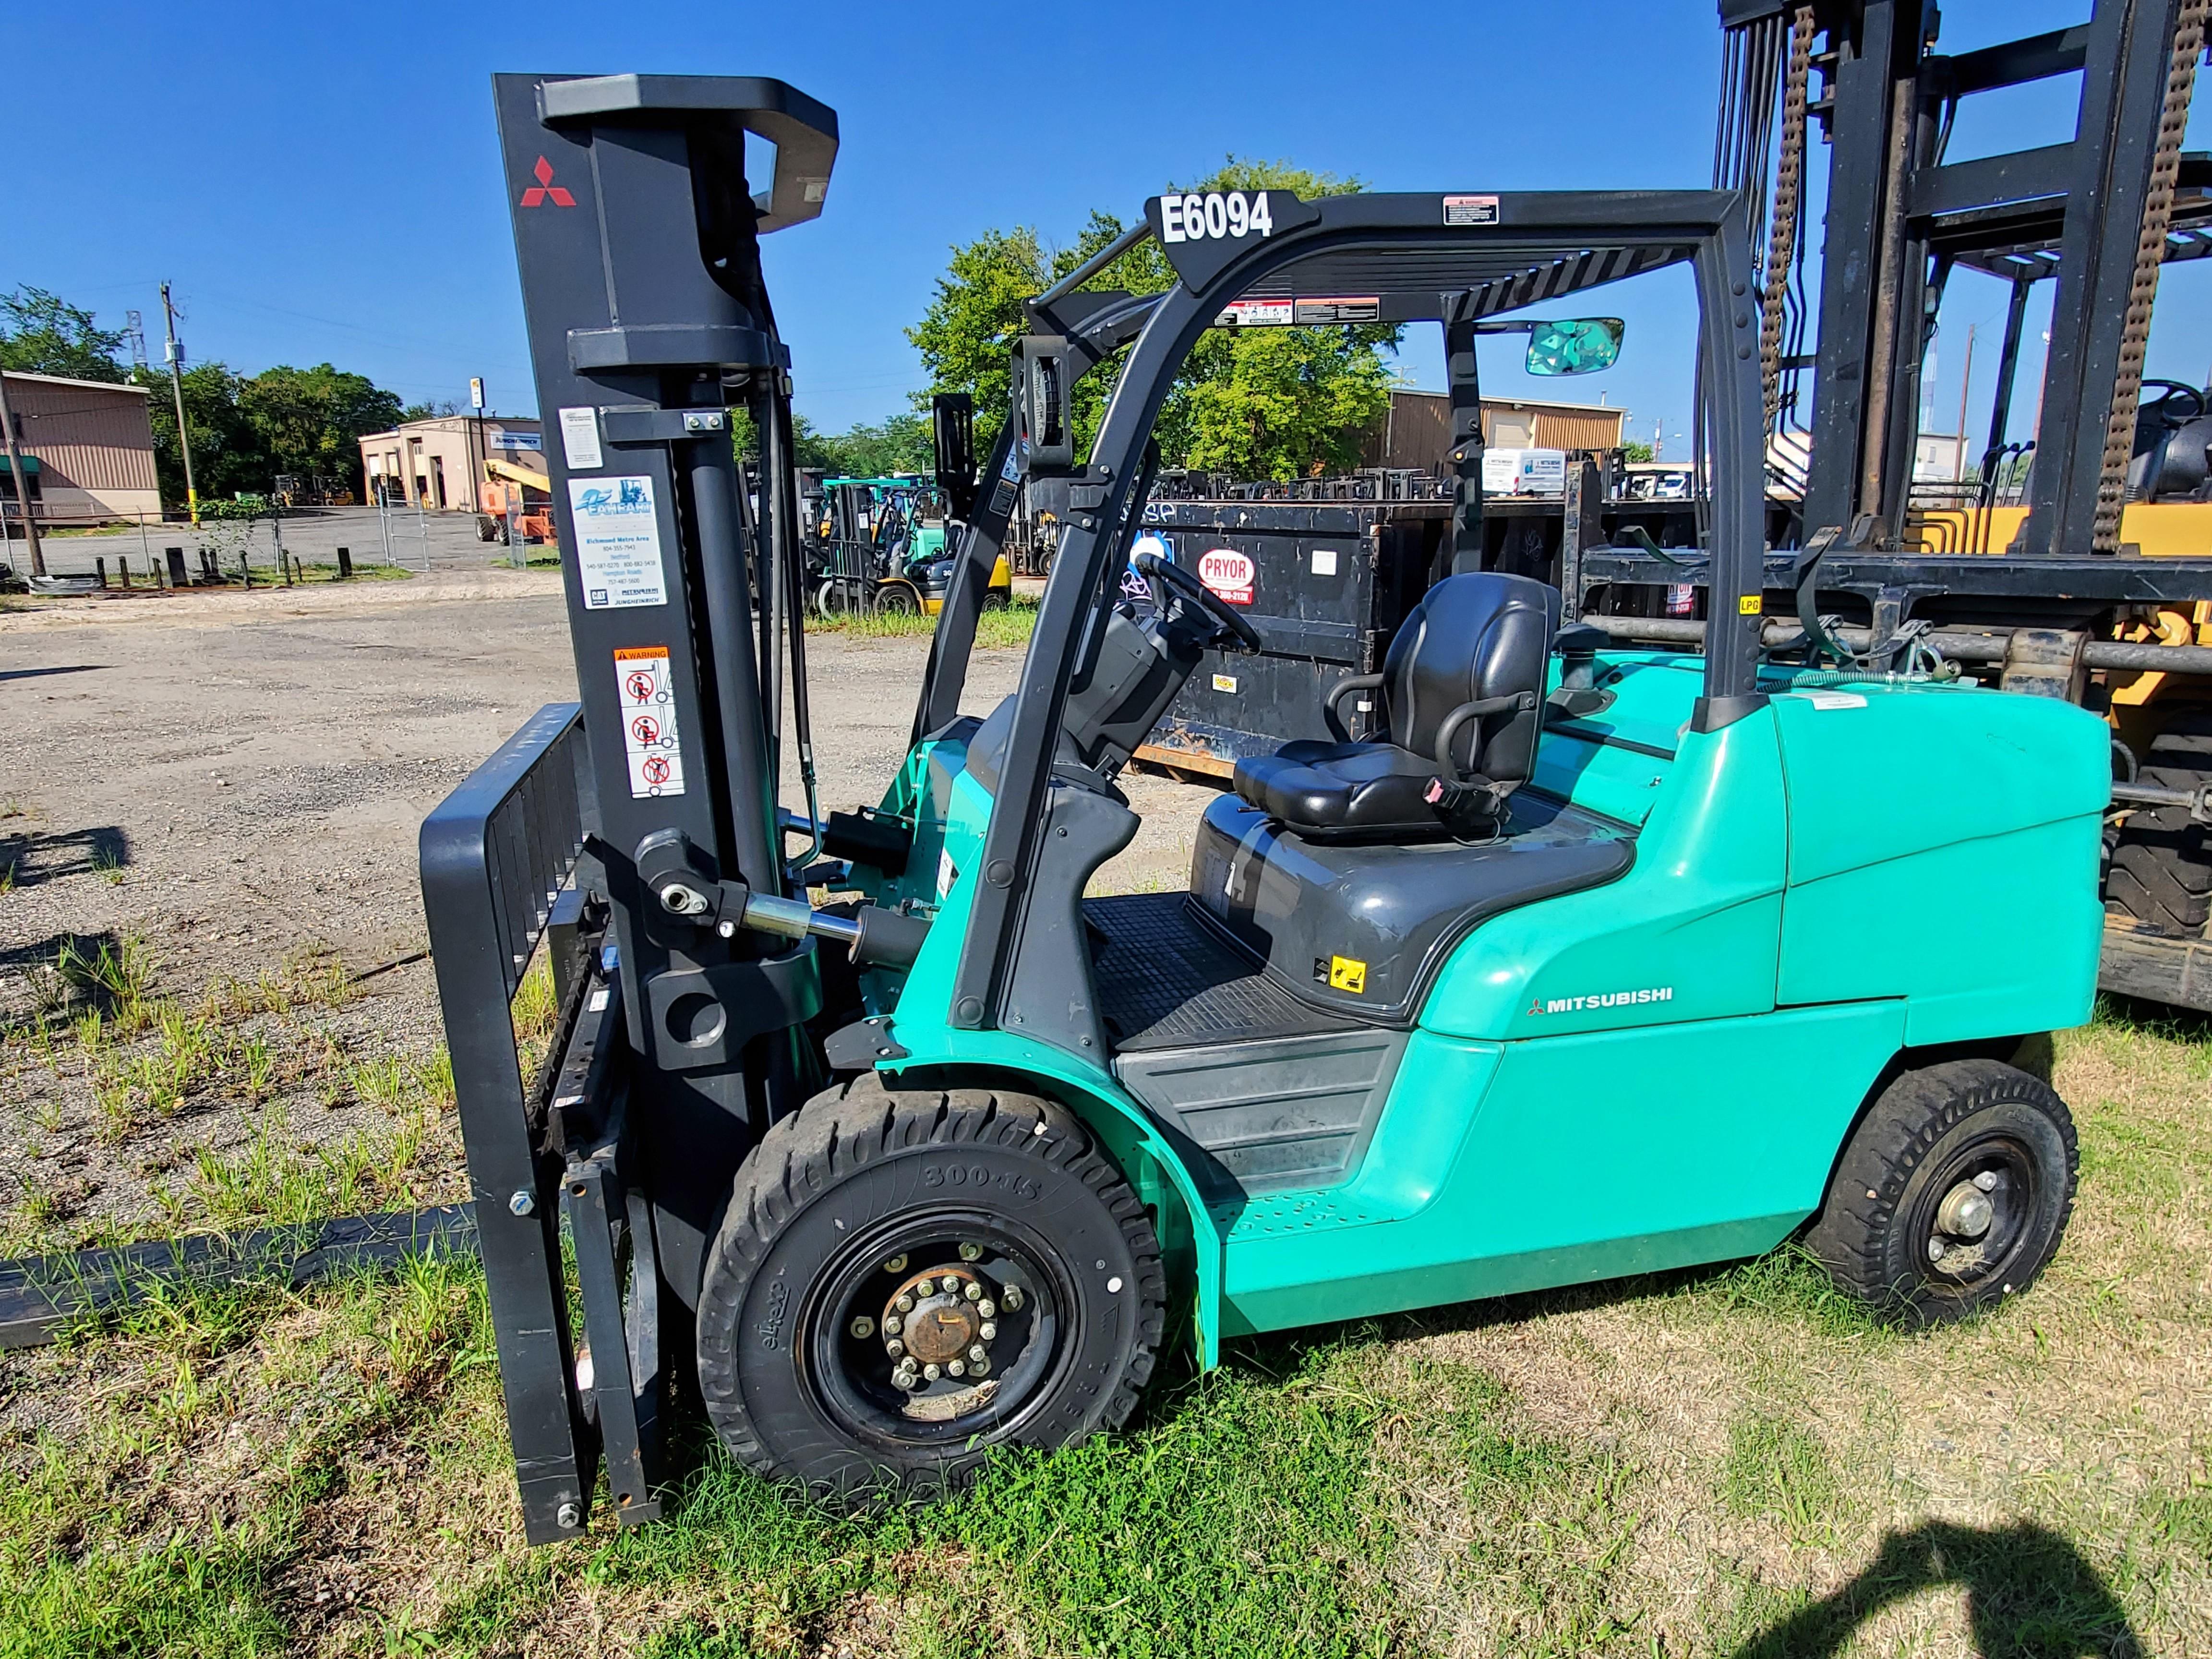 Used, 2014, Mitsubishi Forklift, FG55N1, Forklifts / Lift Trucks